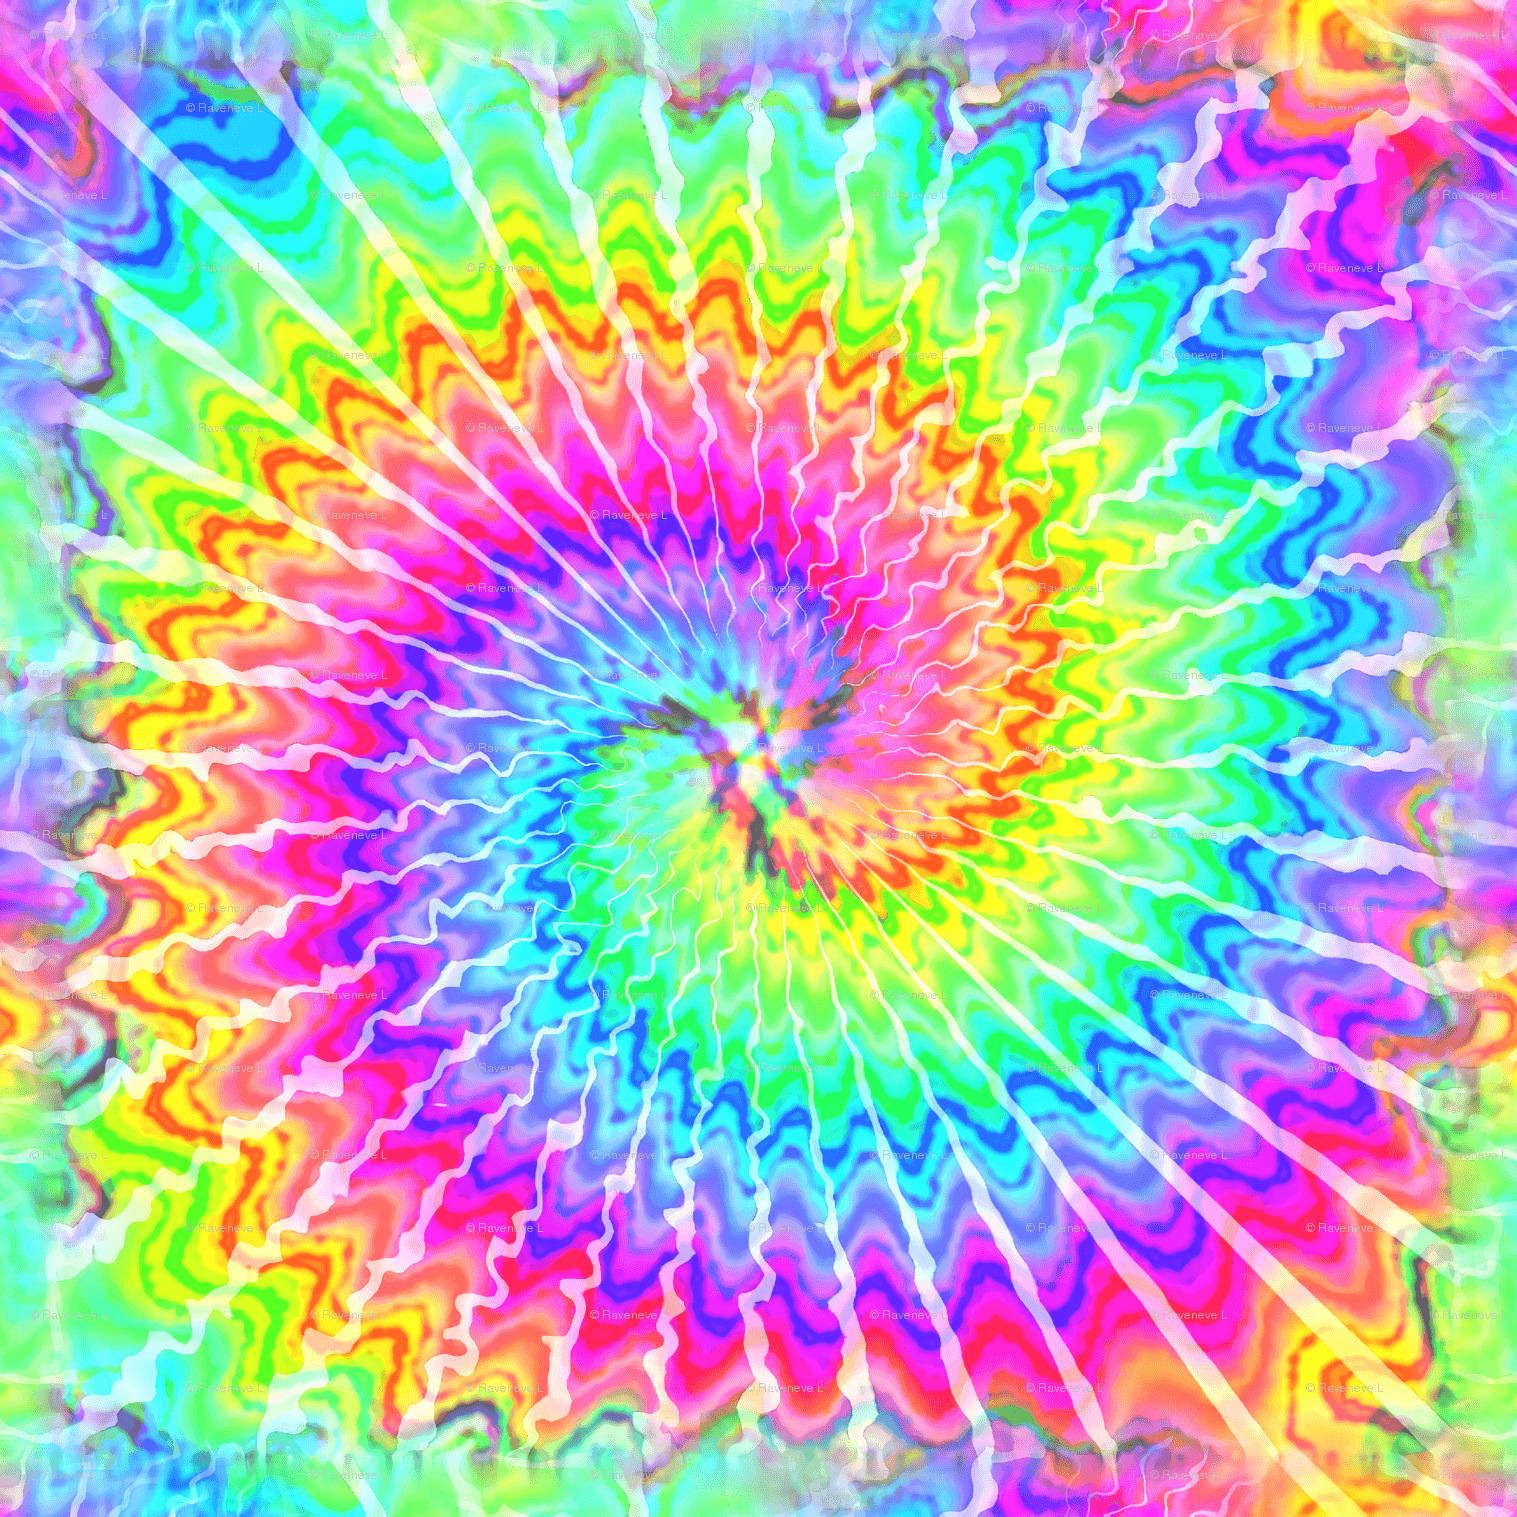 Rainbow Tie Dye Wallpapers - Top Free Rainbow Tie Dye ...